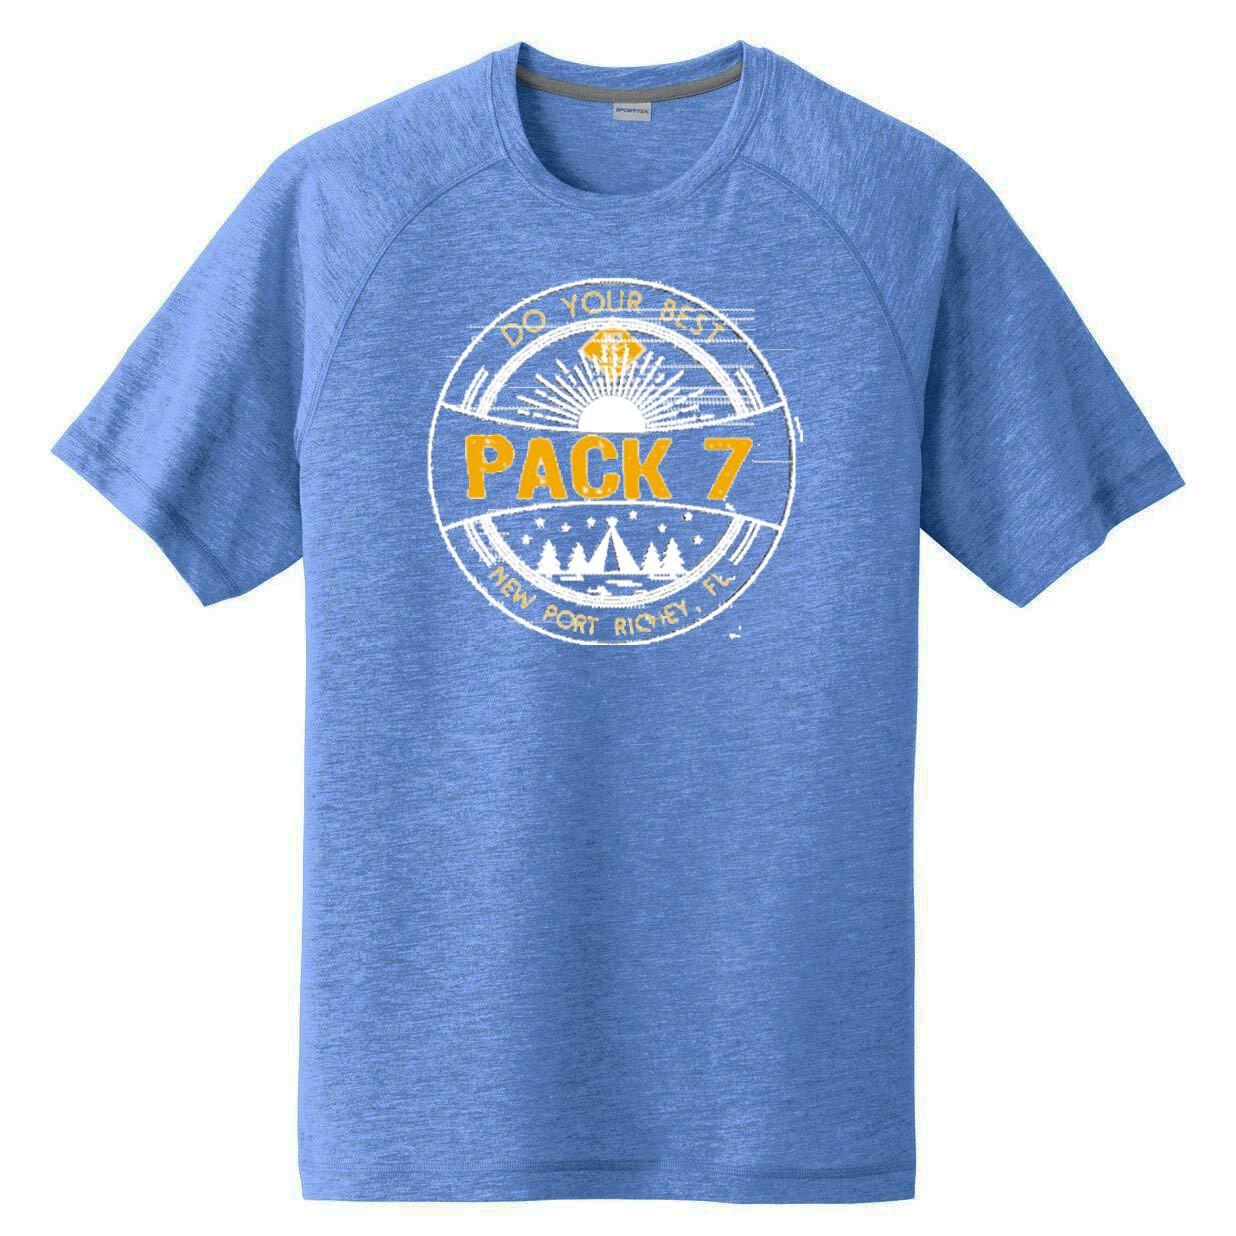 ADULT Pack T-Shirt (S-4XL)